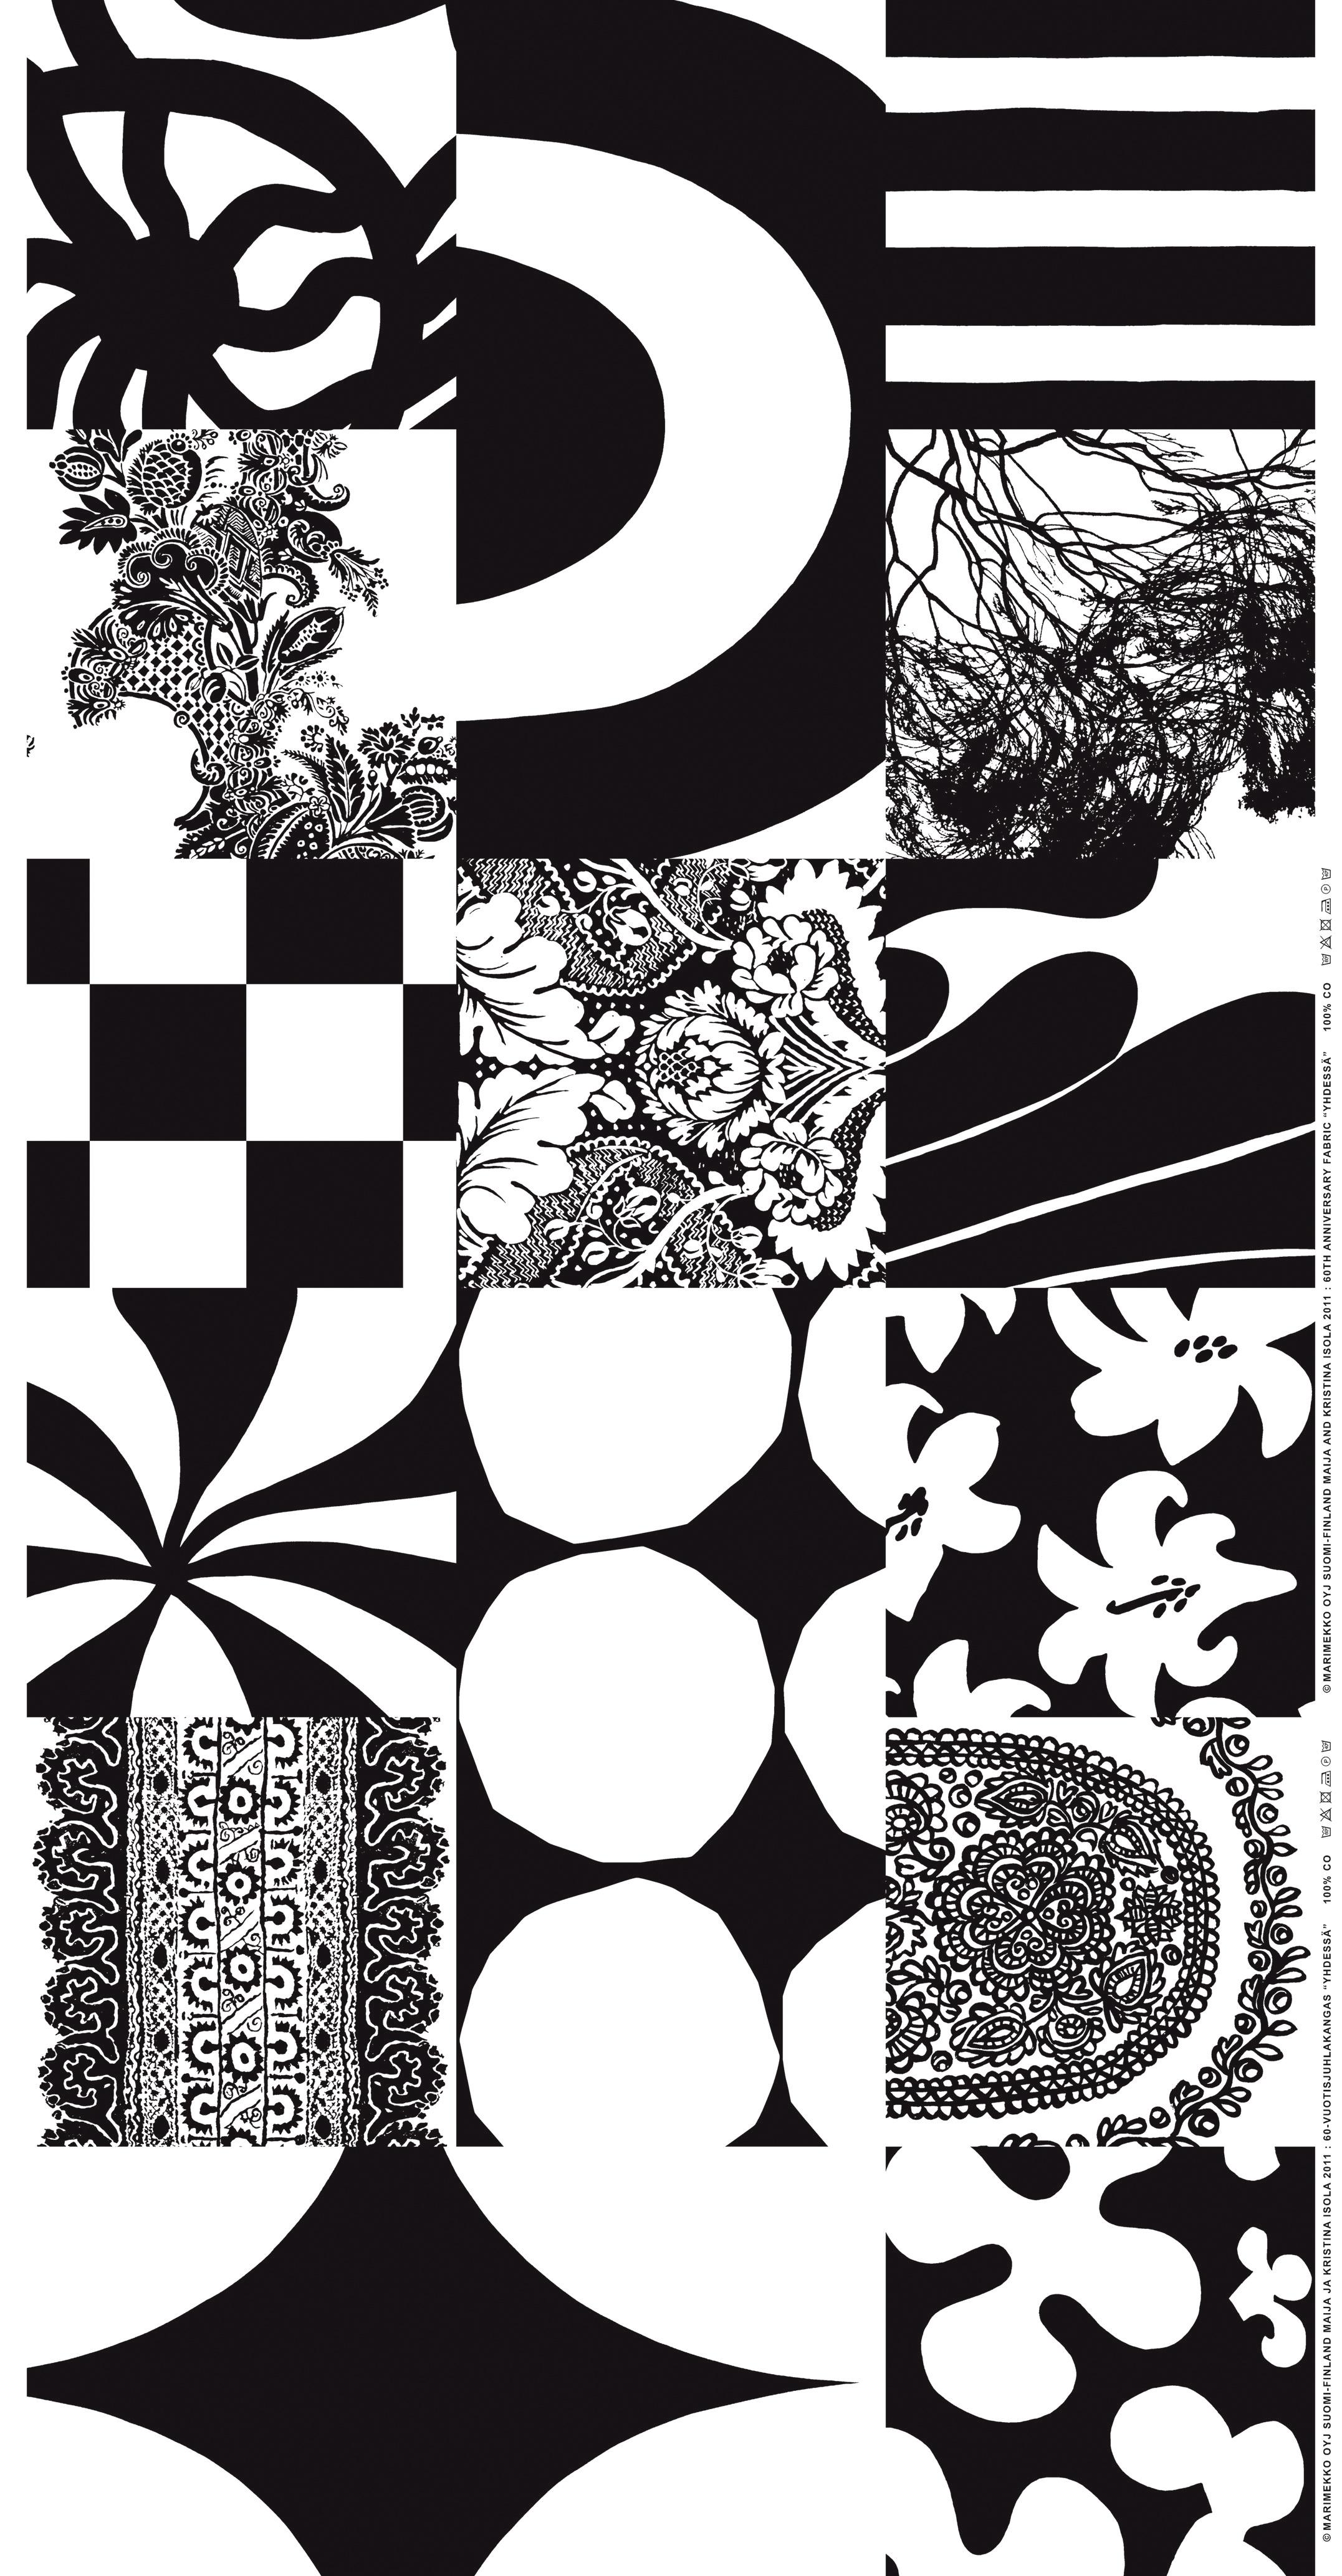 Modern Never Gets Old Marimekko Celebrates 60 Years Of Design